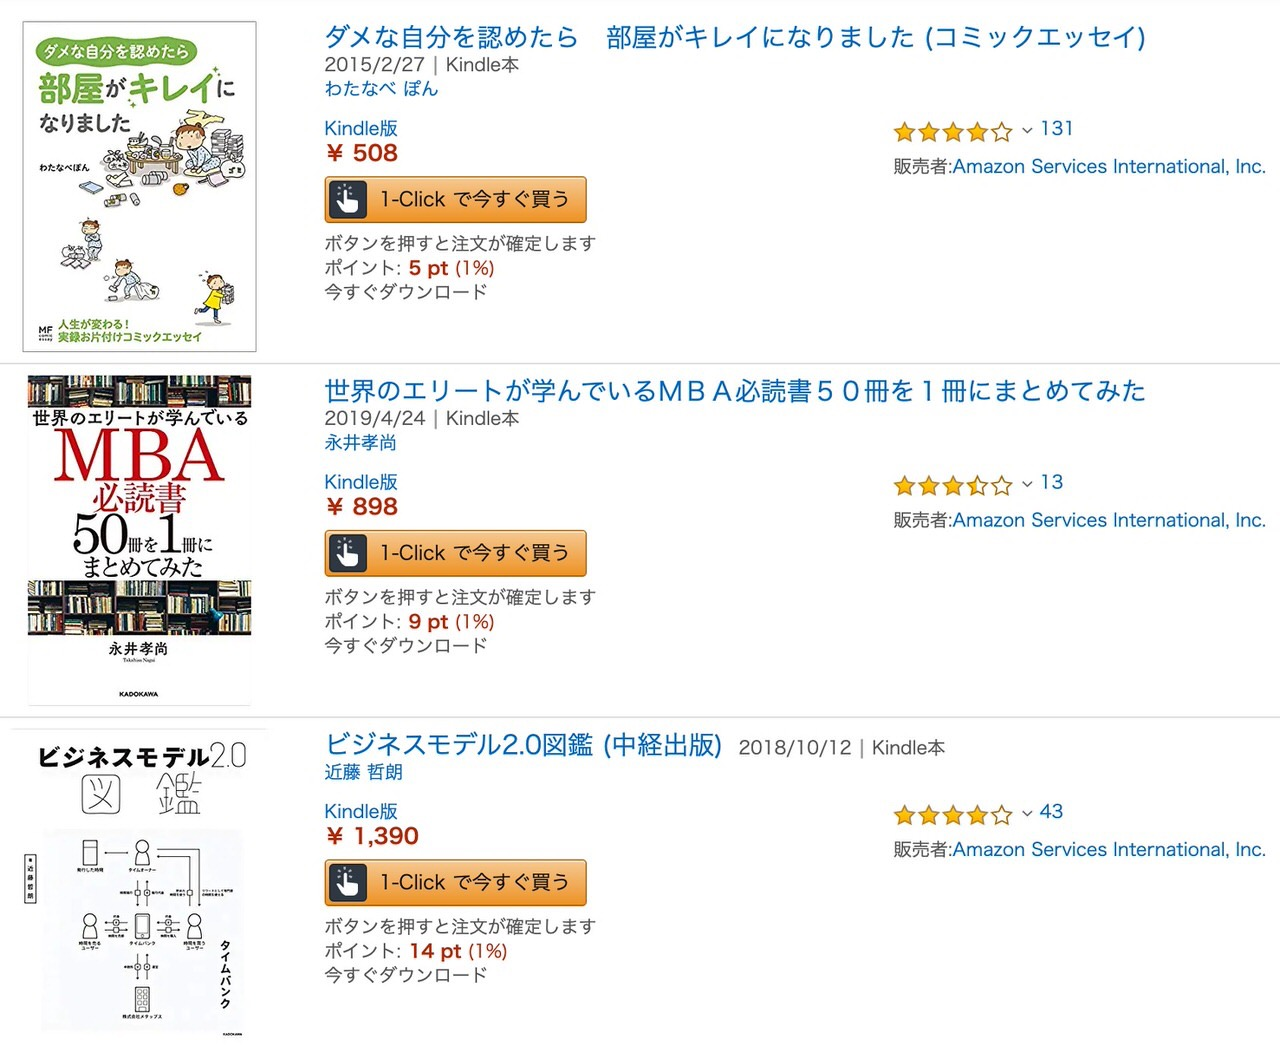 【Kindleセール】星座占いから筋トレまで「KADOKAWAビジネス&実用本フェア」開催中(9/26まで)